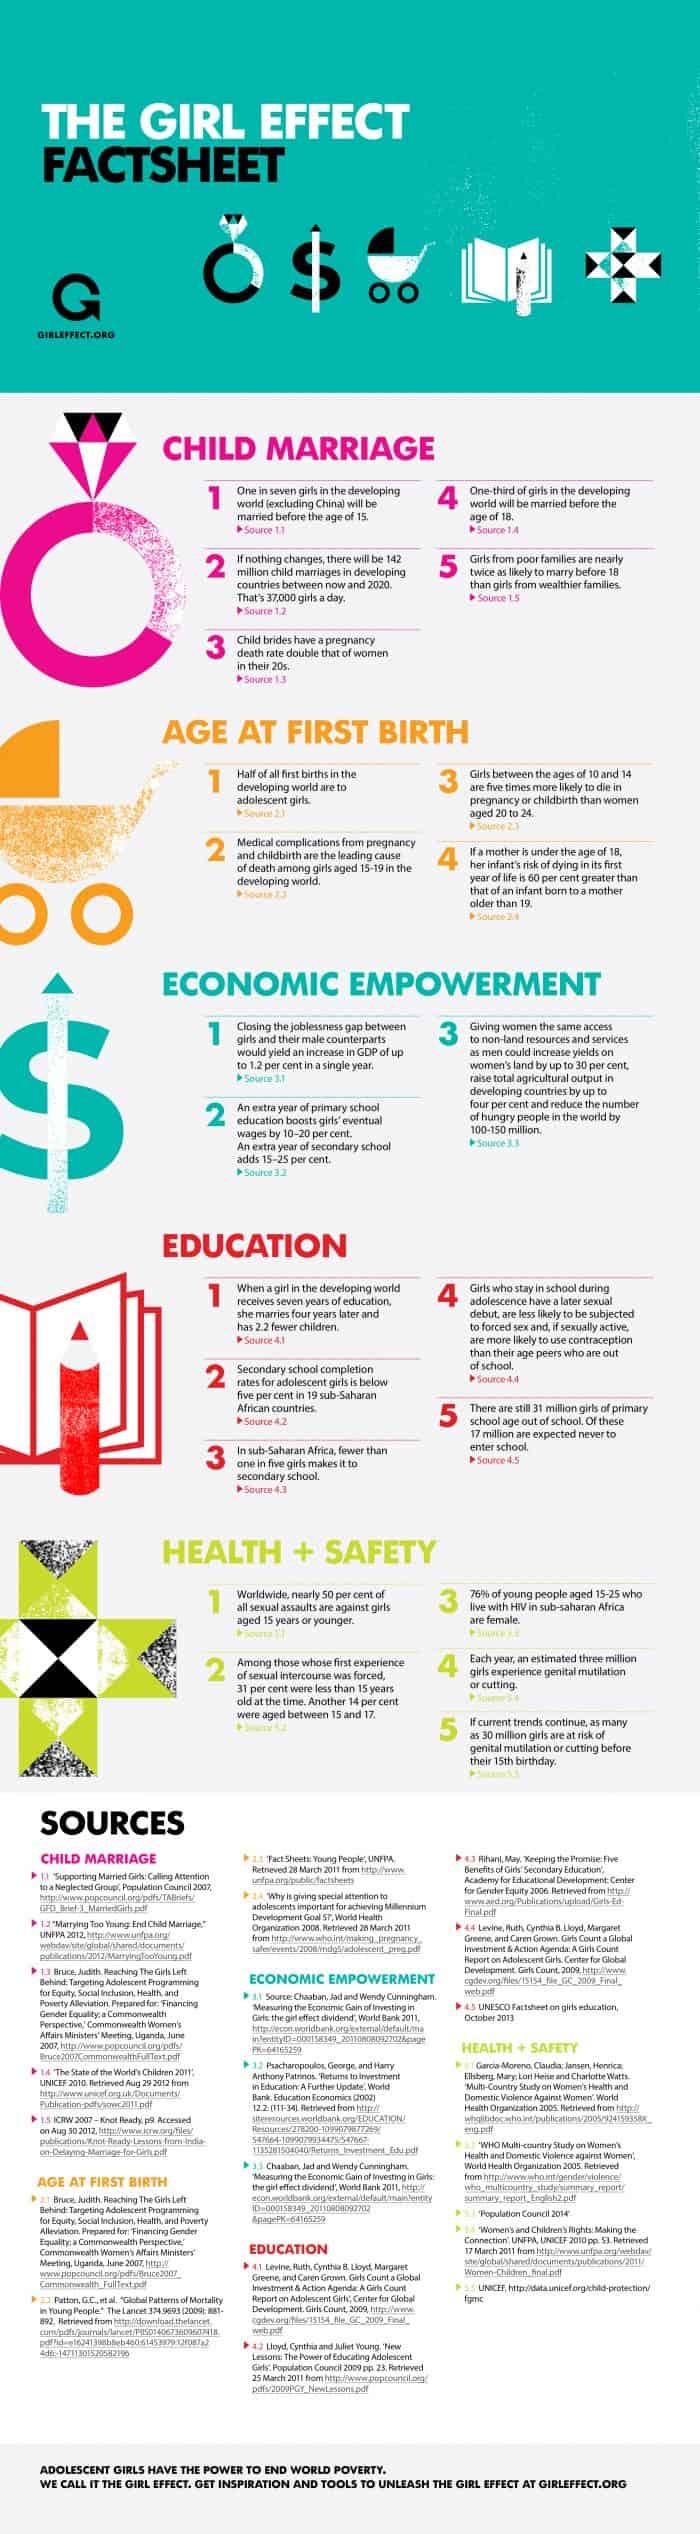 Girl Effect Fact Sheet Infographic